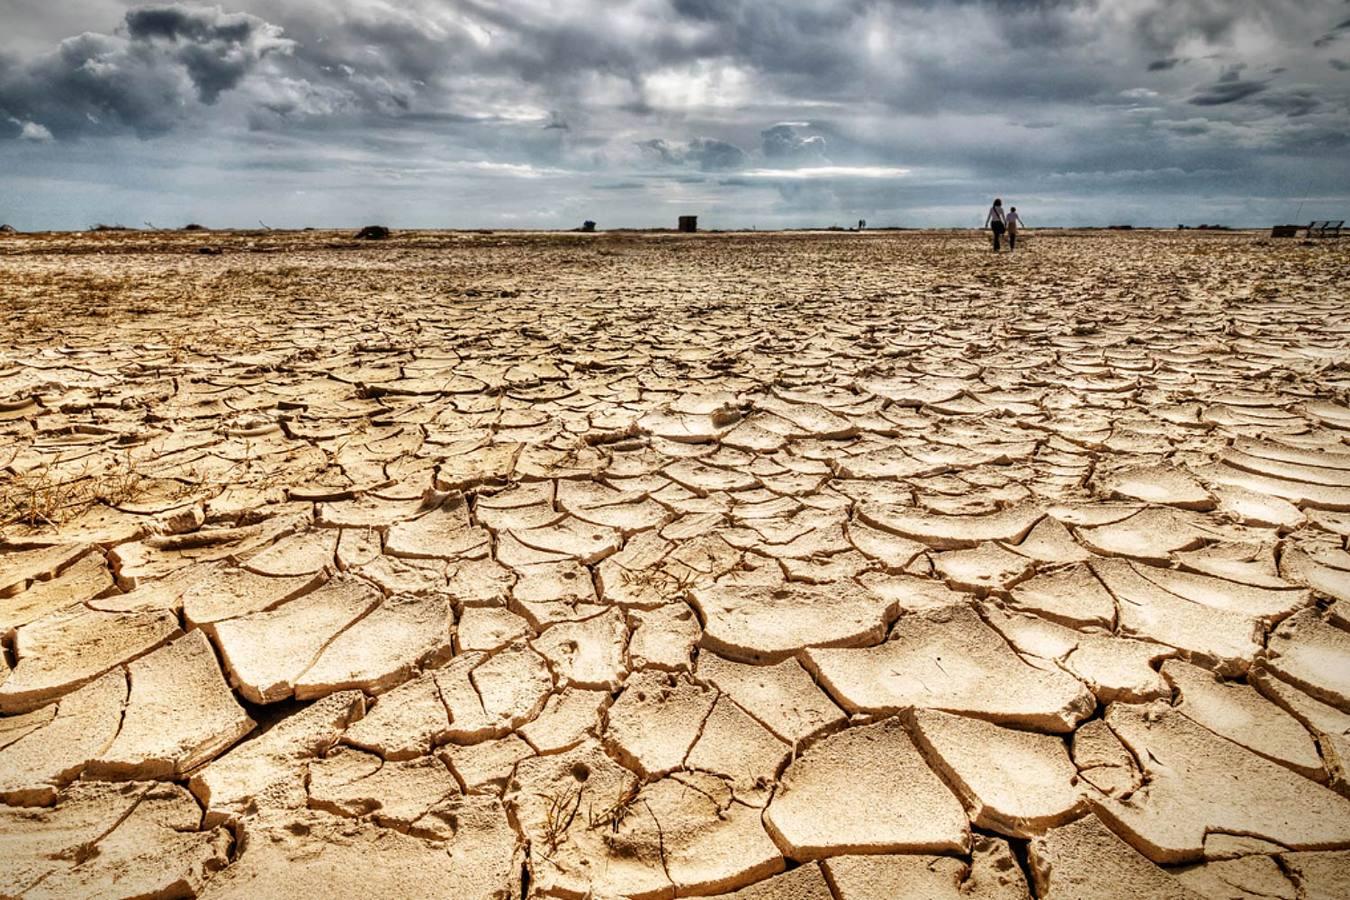 Cambio clim tico quedan esc pticos diez fotos para ellos for Soil meaning in english